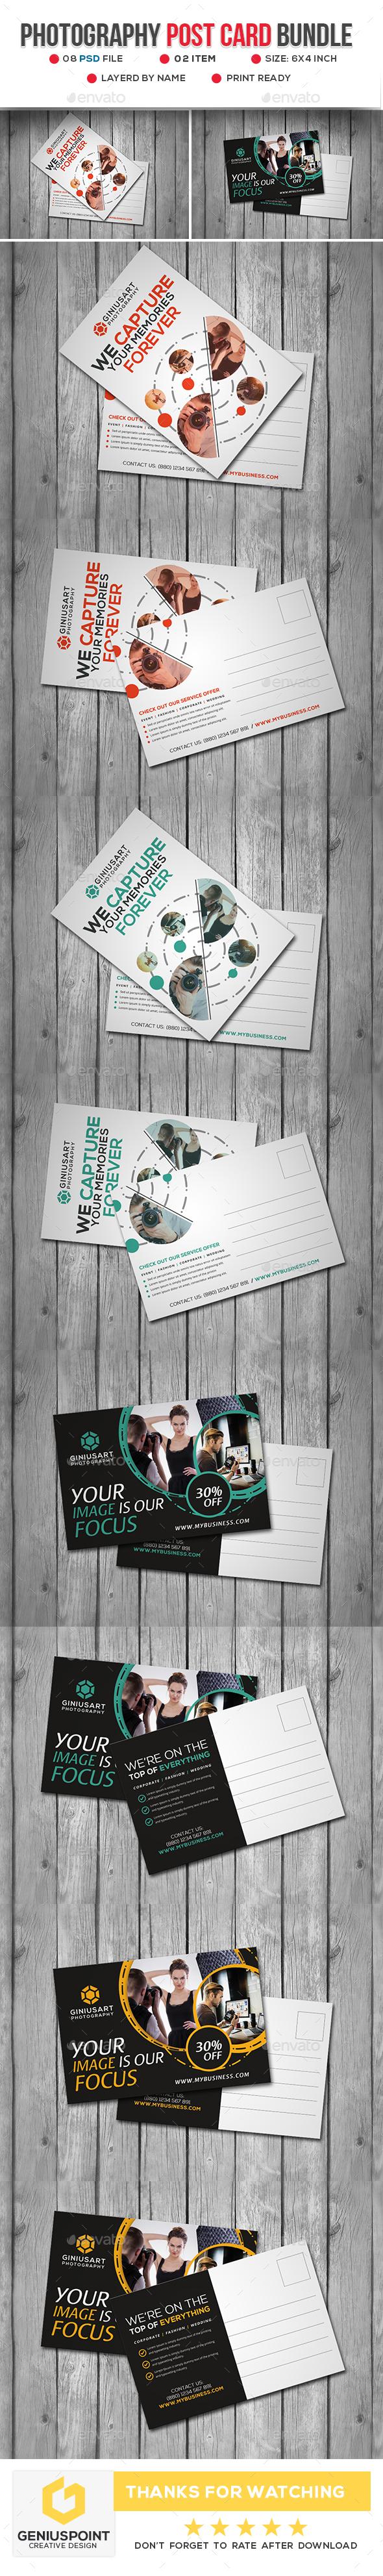 Photography Post Card Bundle - Cards & Invites Print Templates